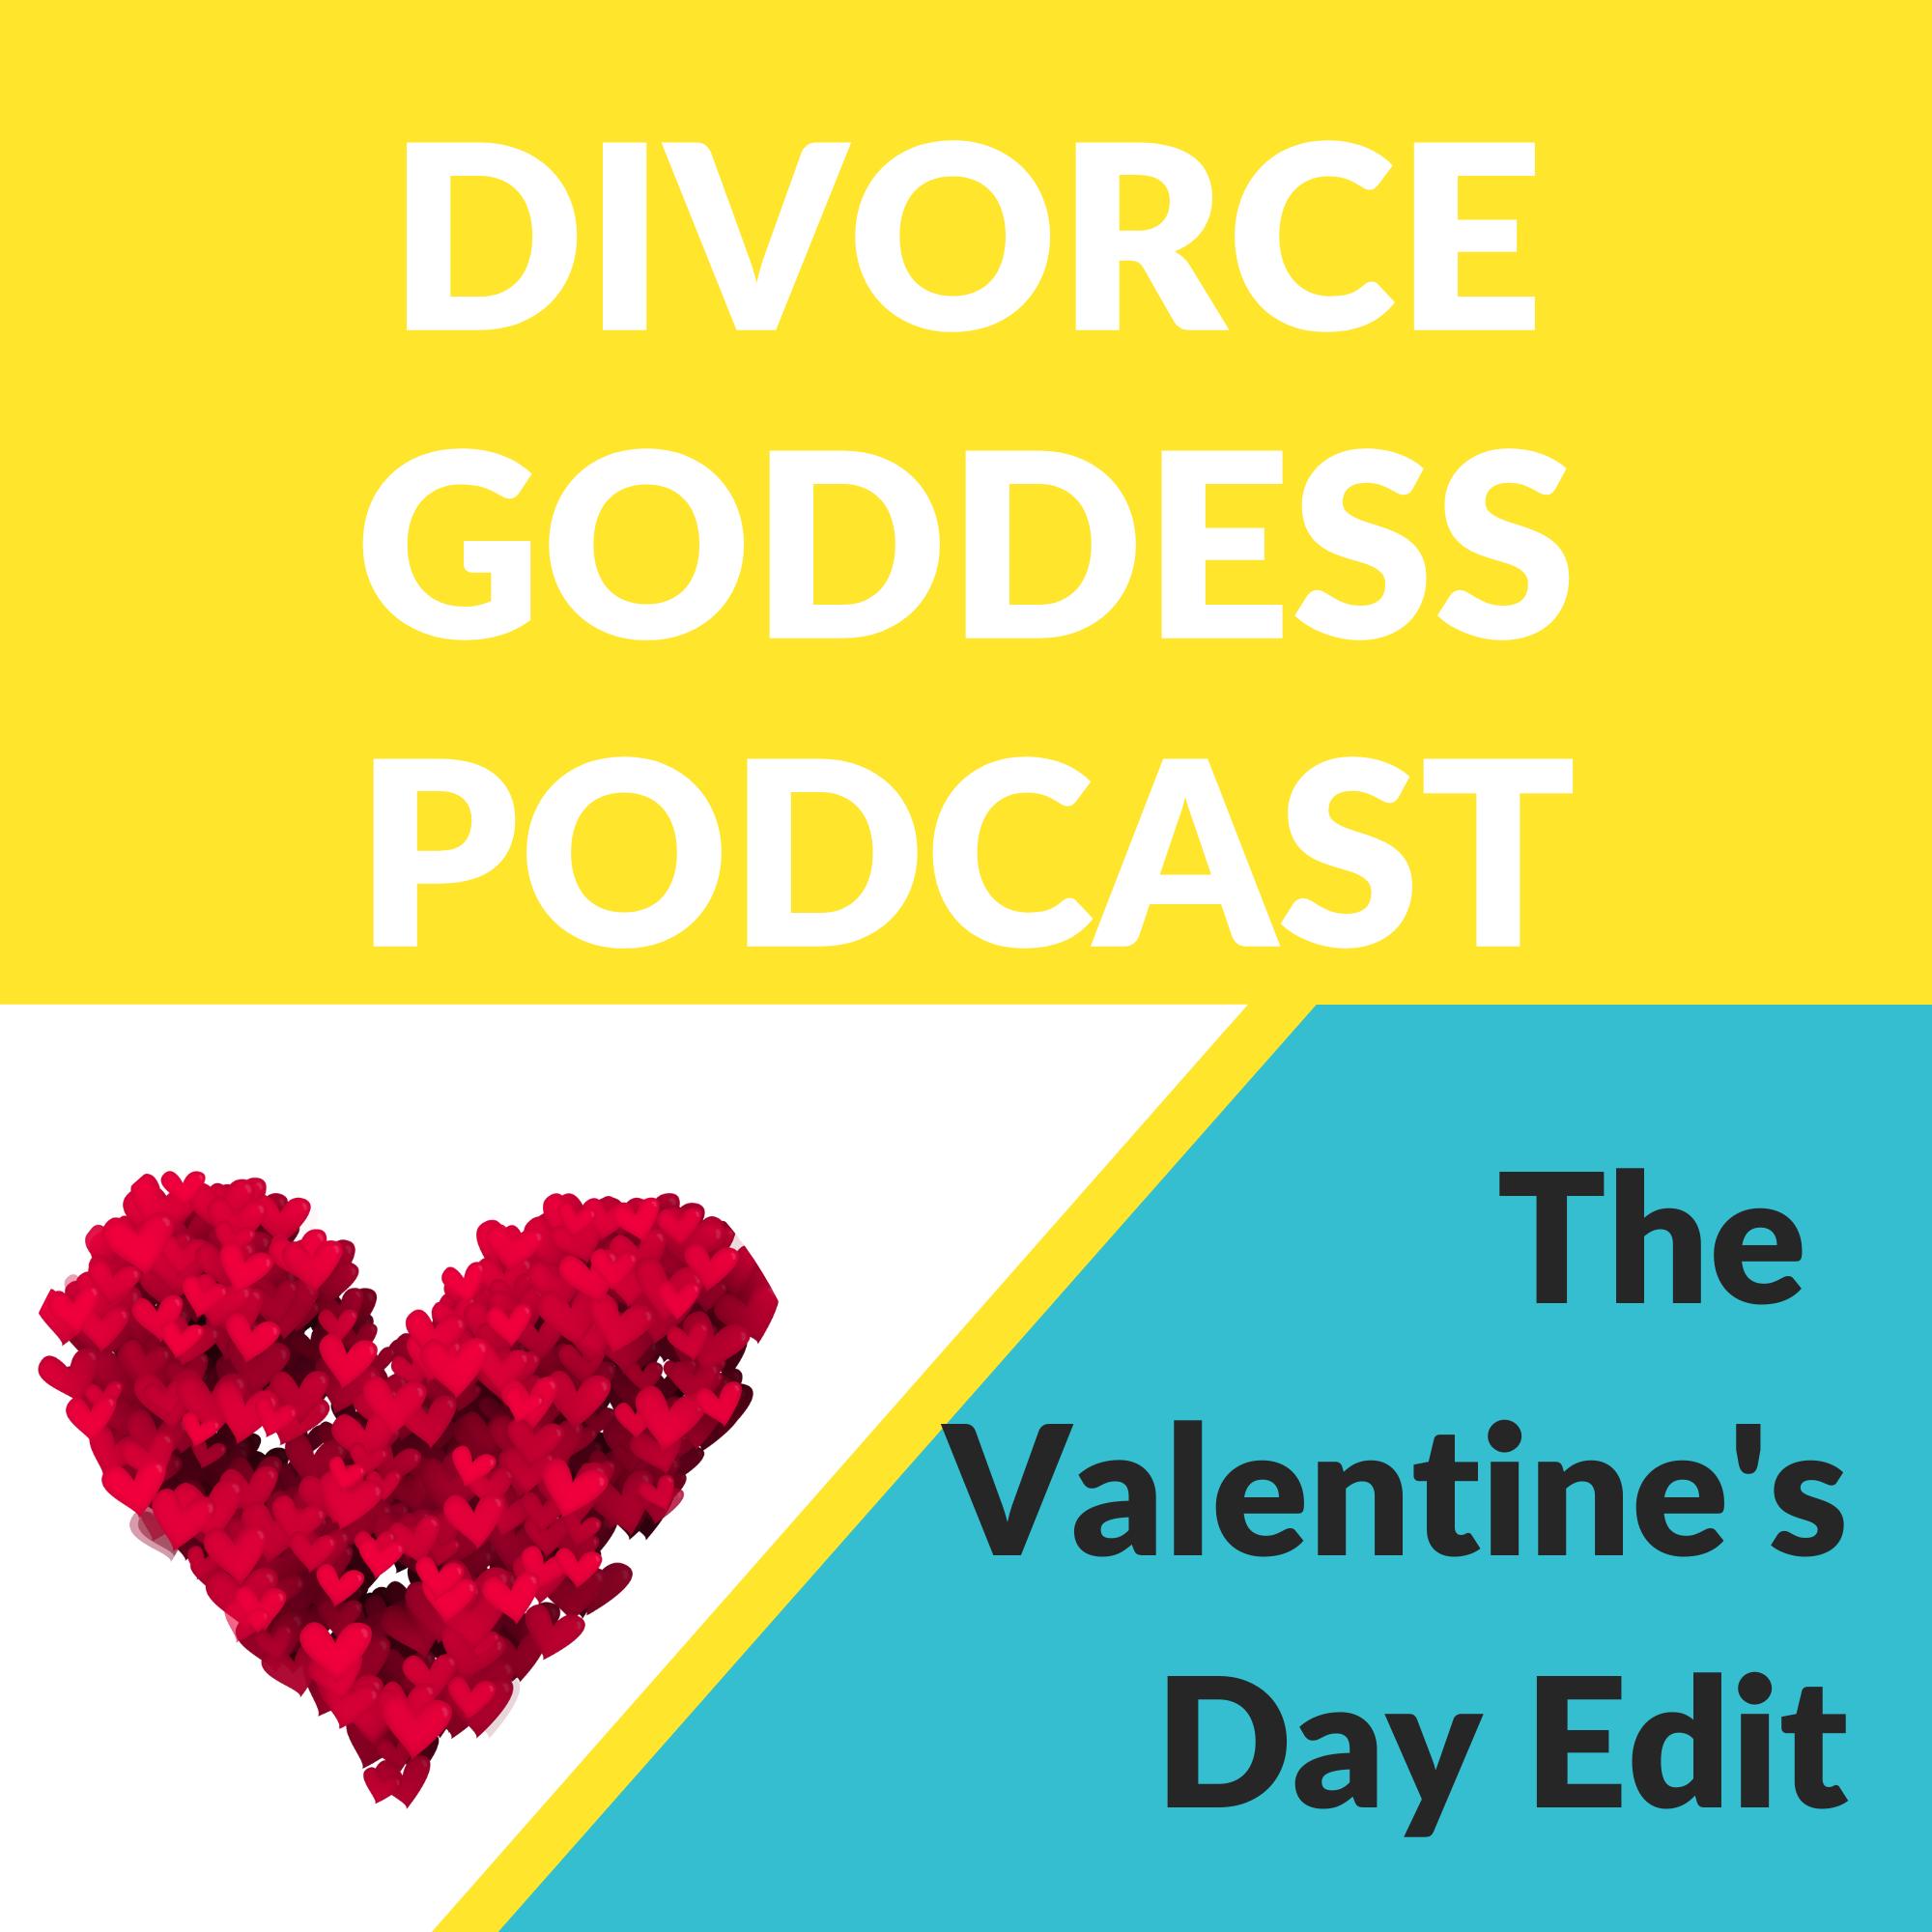 Divorce Goddess Podcast - The Valentine's Day Edit